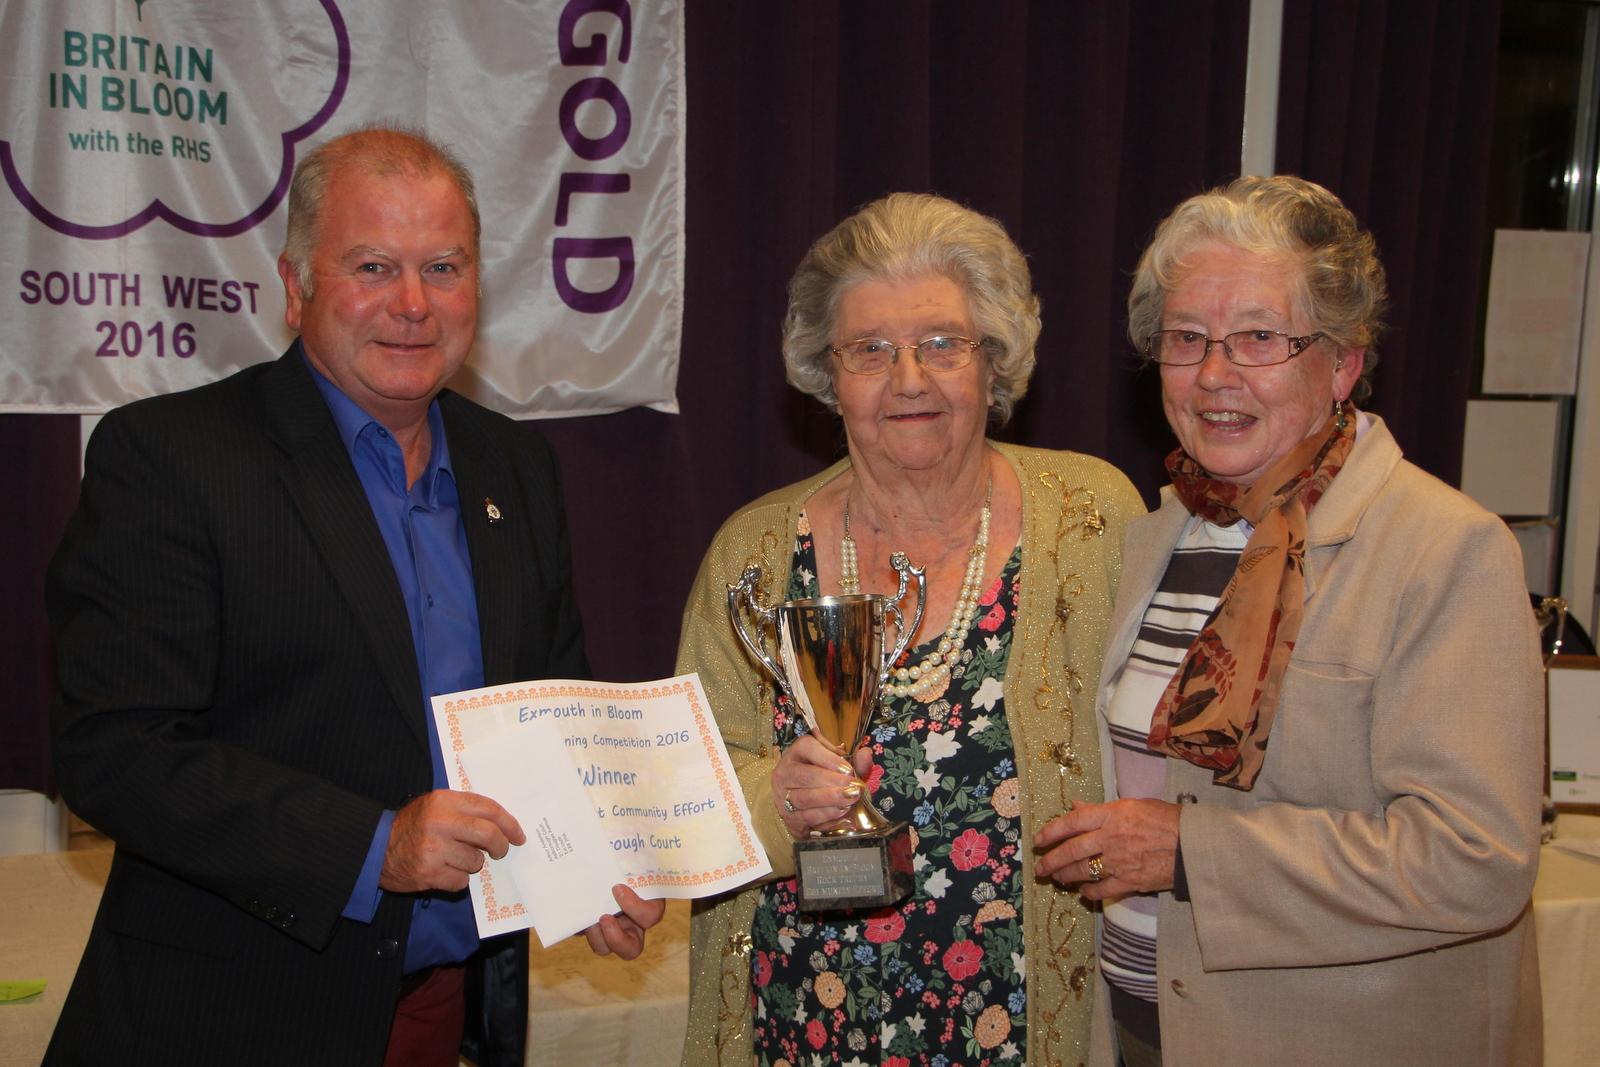 Martin & Eileen Rock present Rock Trophy for best community effort to Aldborough Court resident